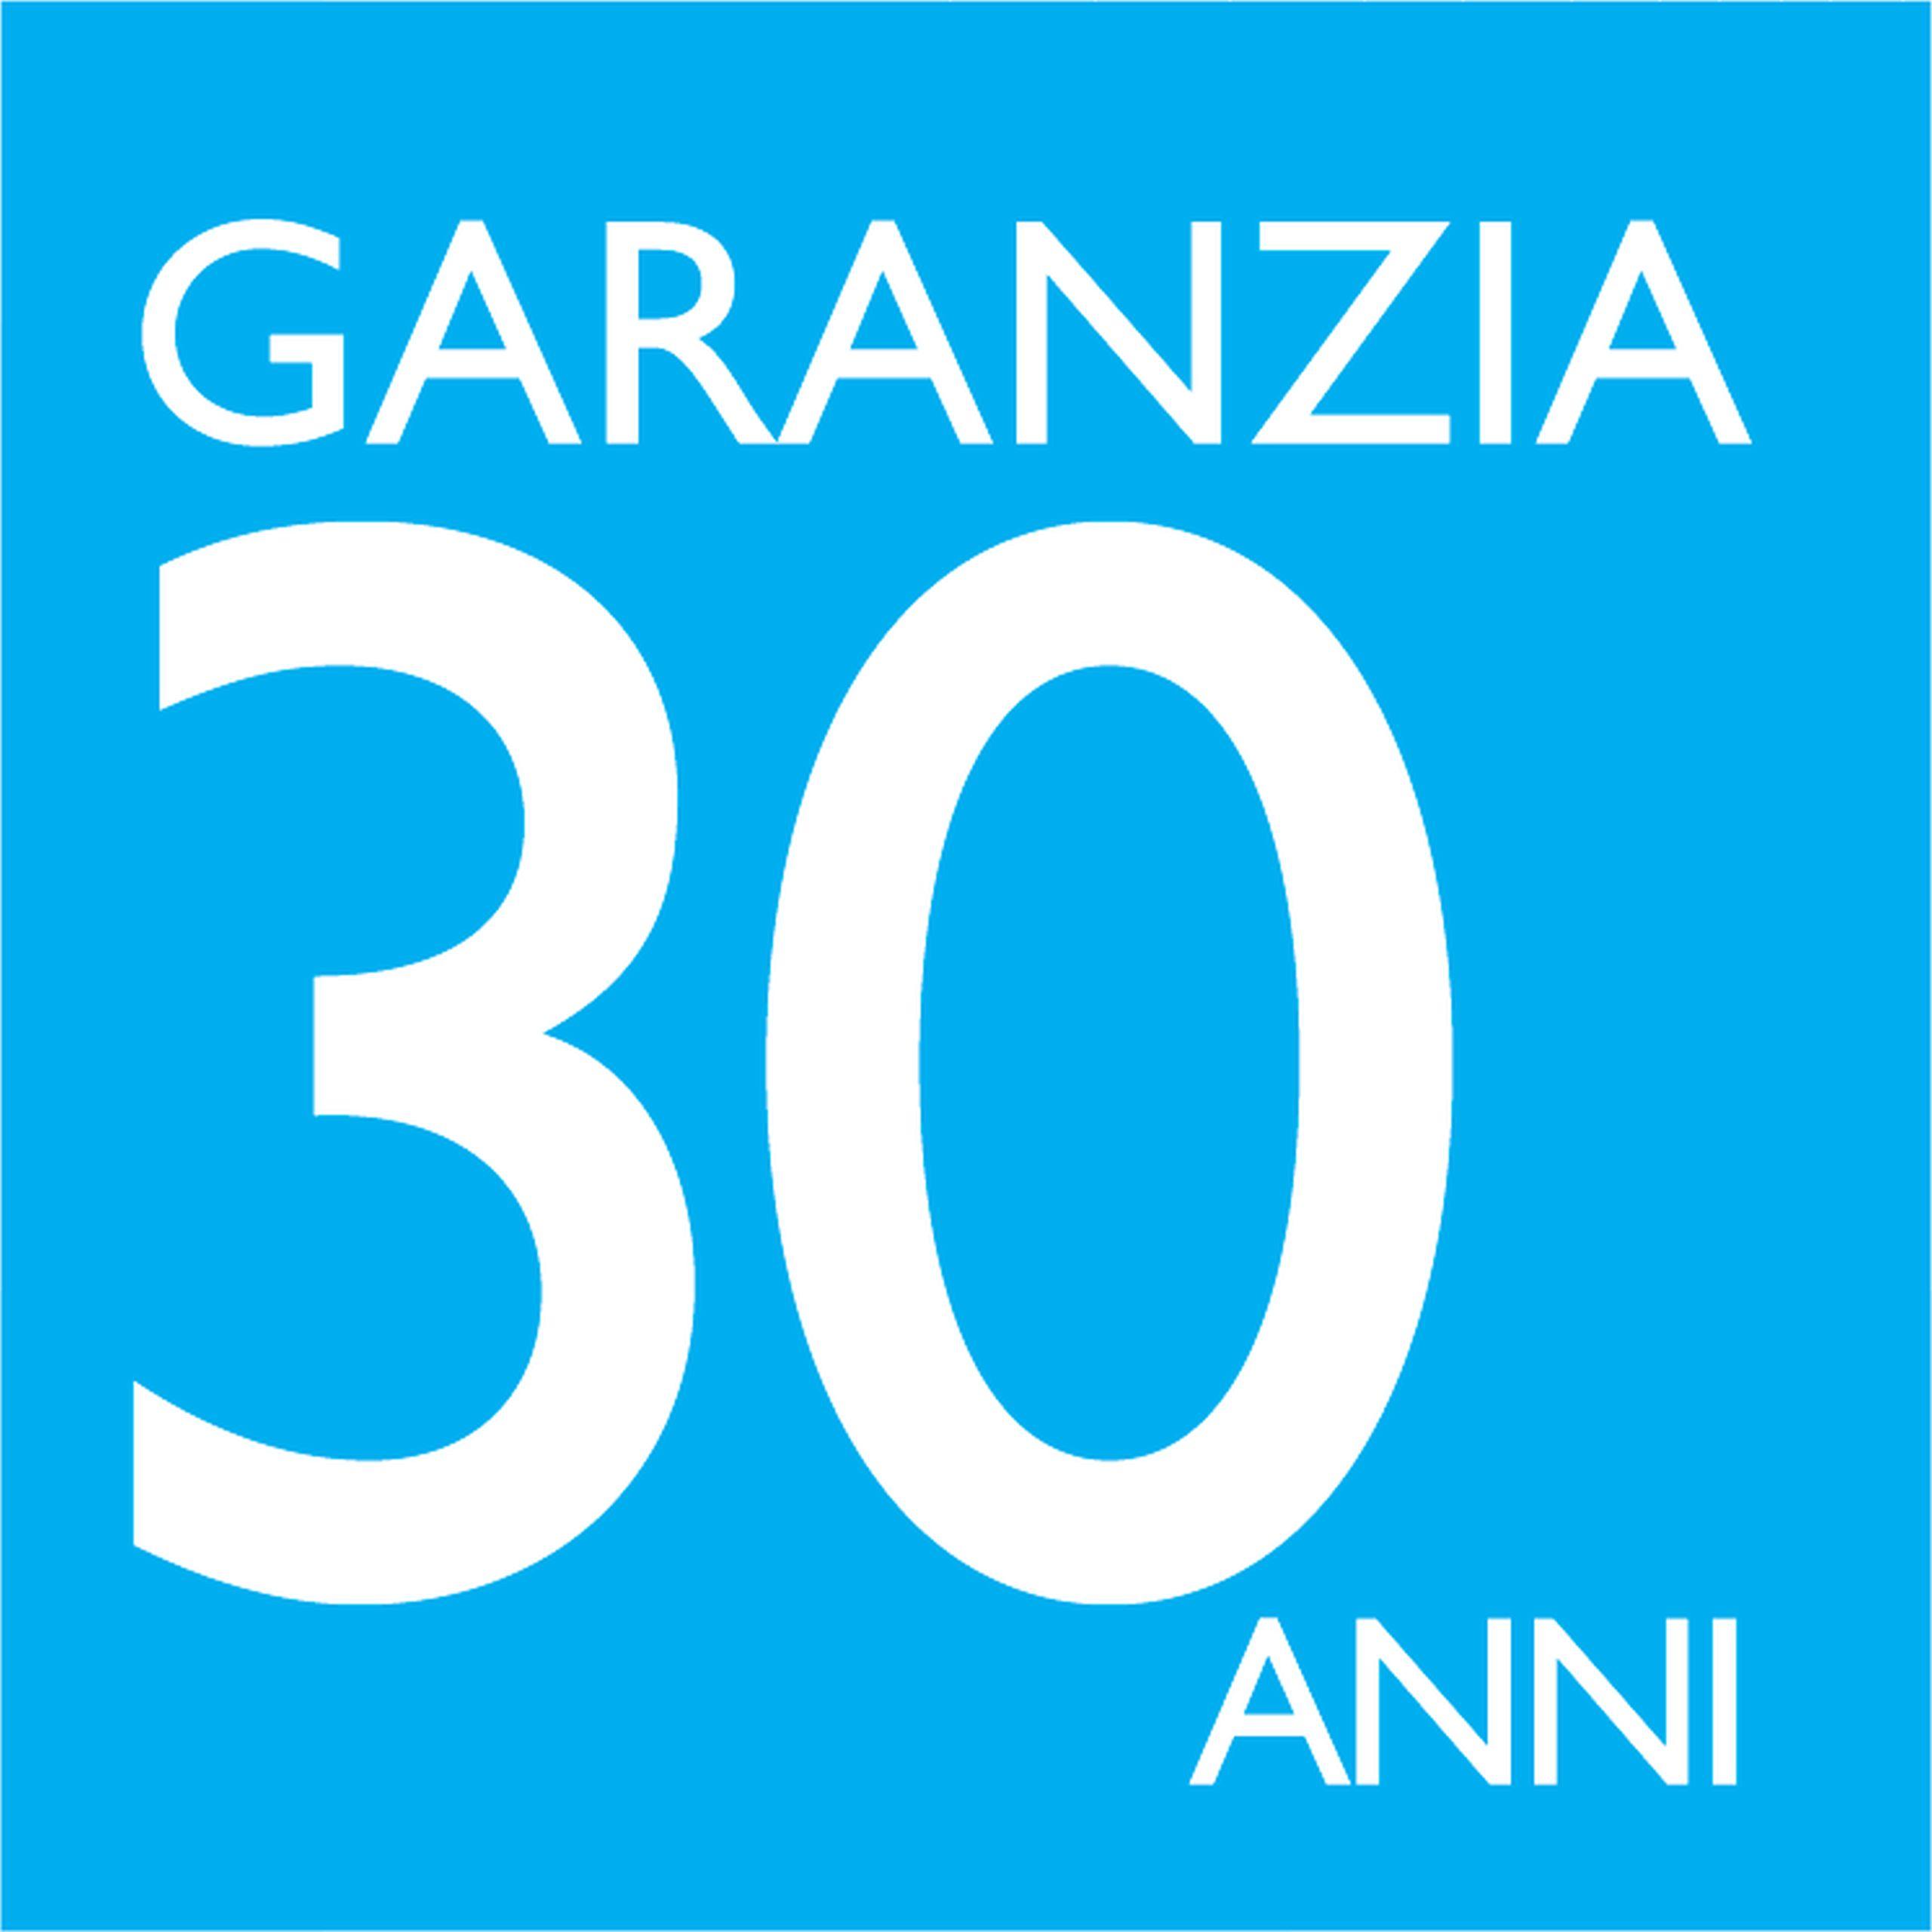 Garanzia-30-anni